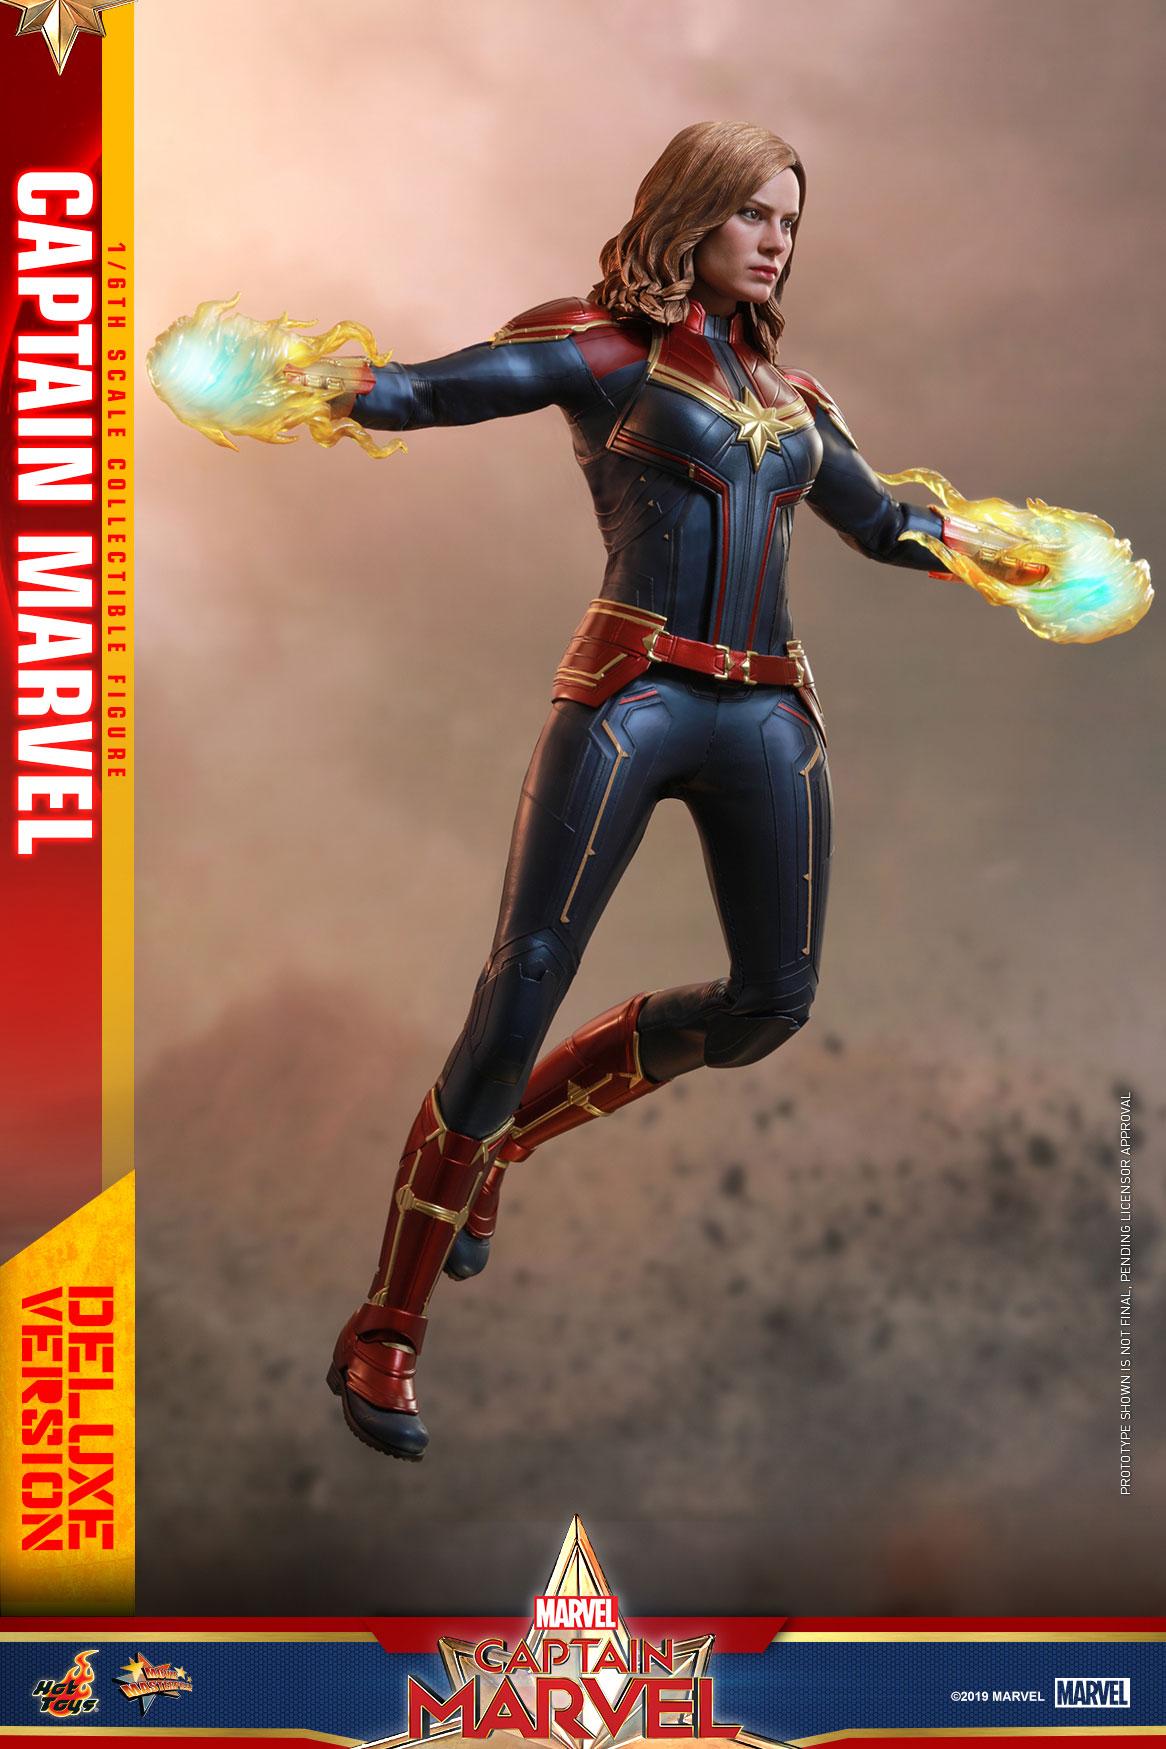 Hot-Toys---Captain-Marvel---Captain-Marvel-collectible-figure-(Deluxe)_PR3